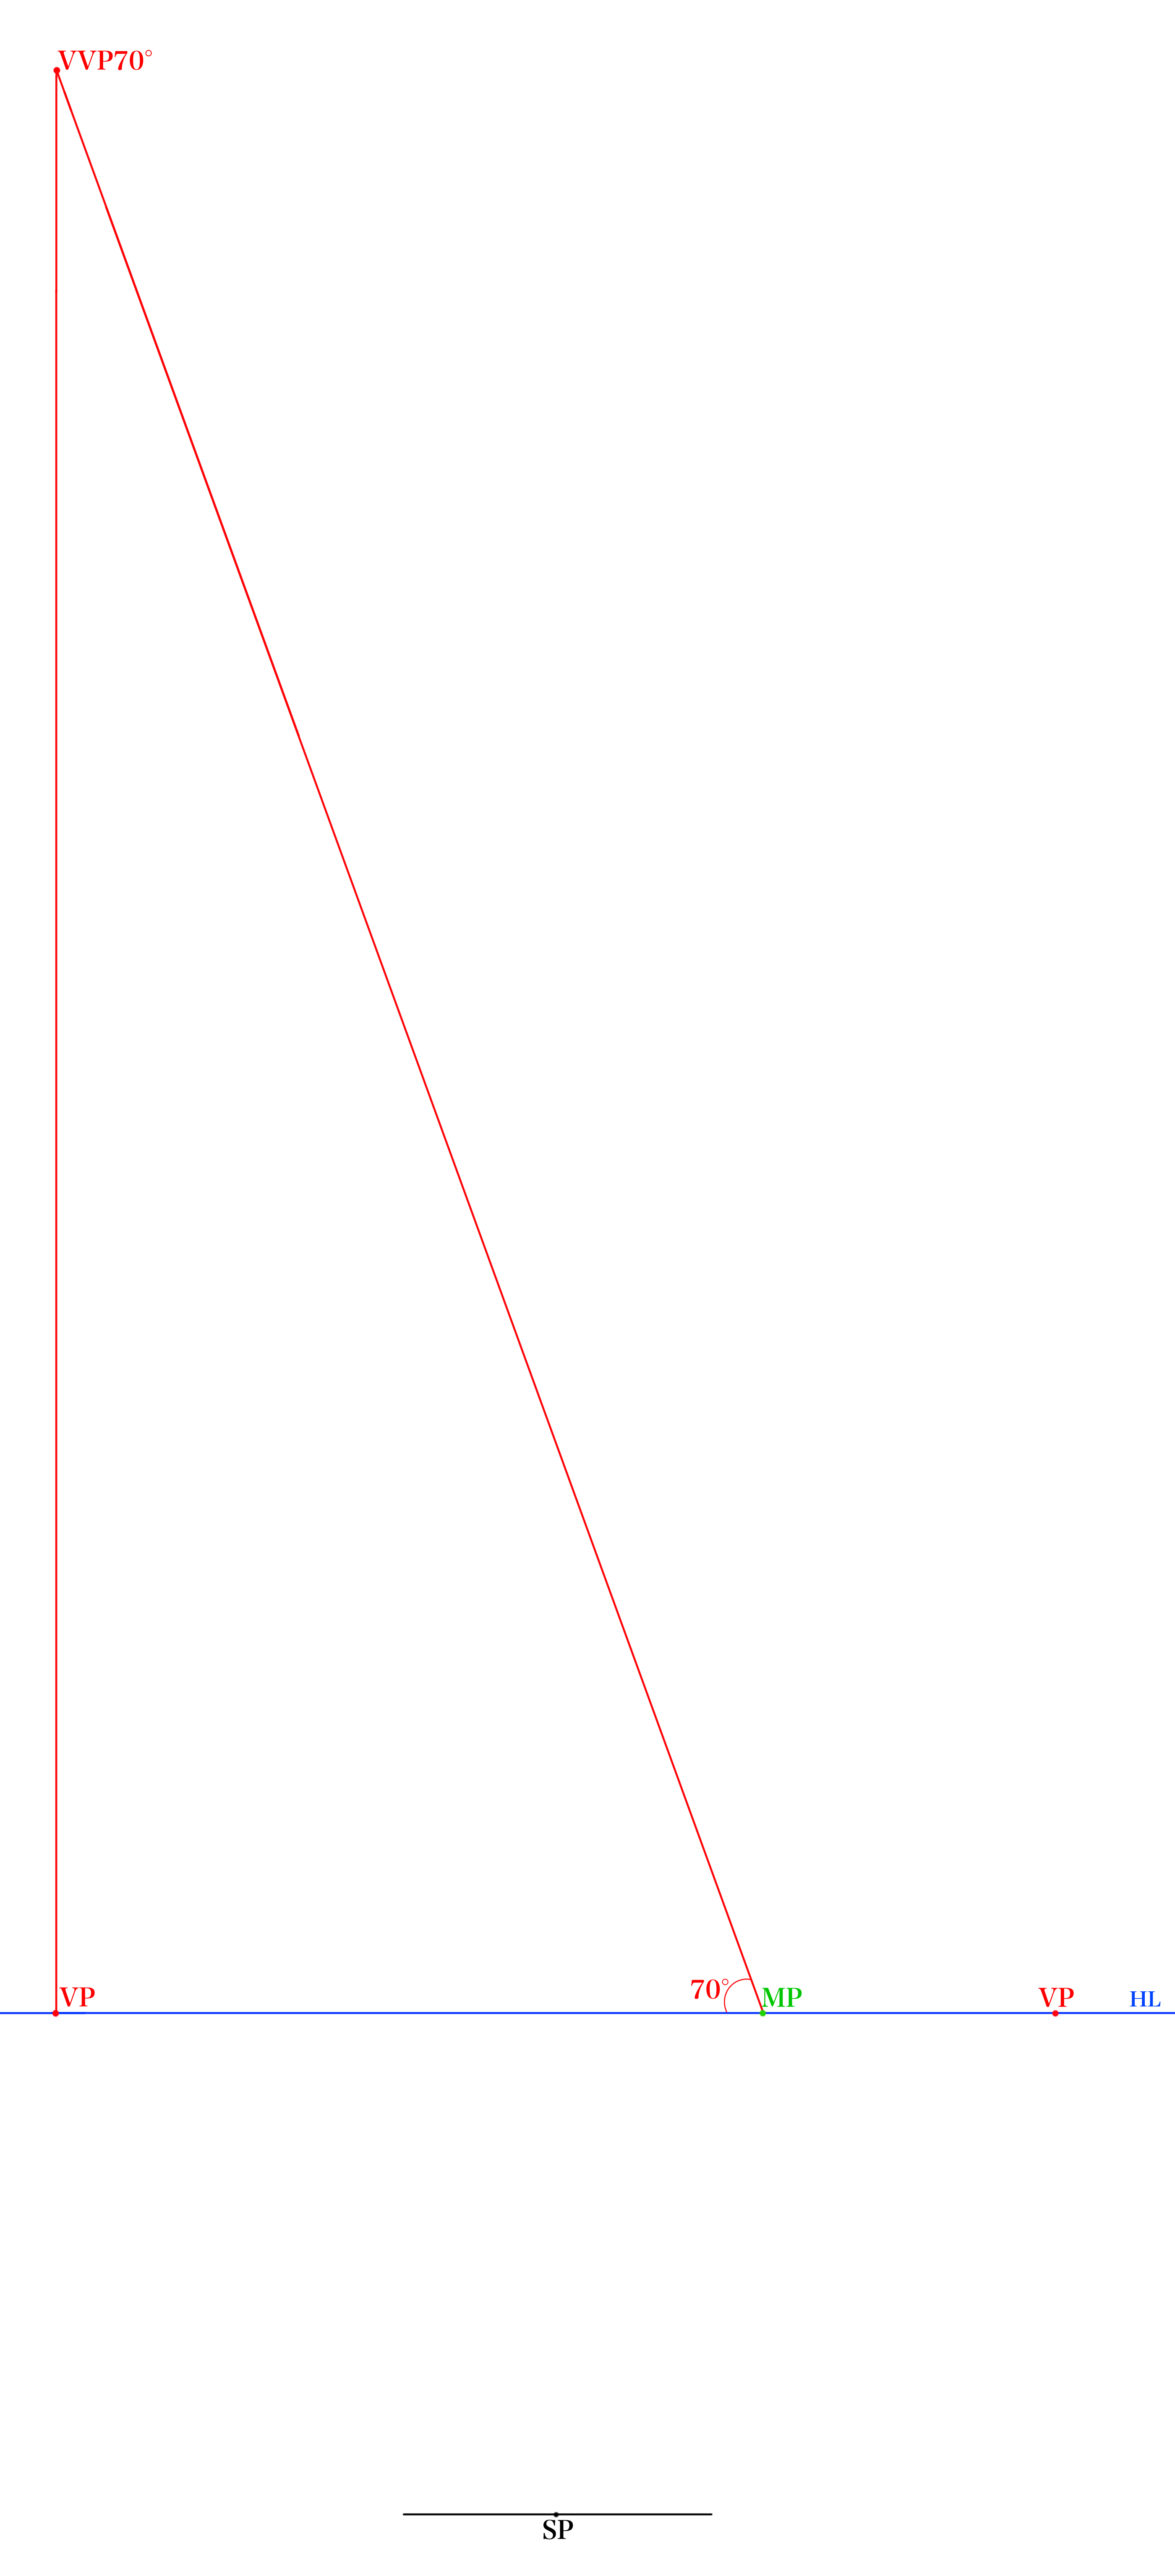 STEP③鏡面の傾きの垂直消失点(VVP)を見つける